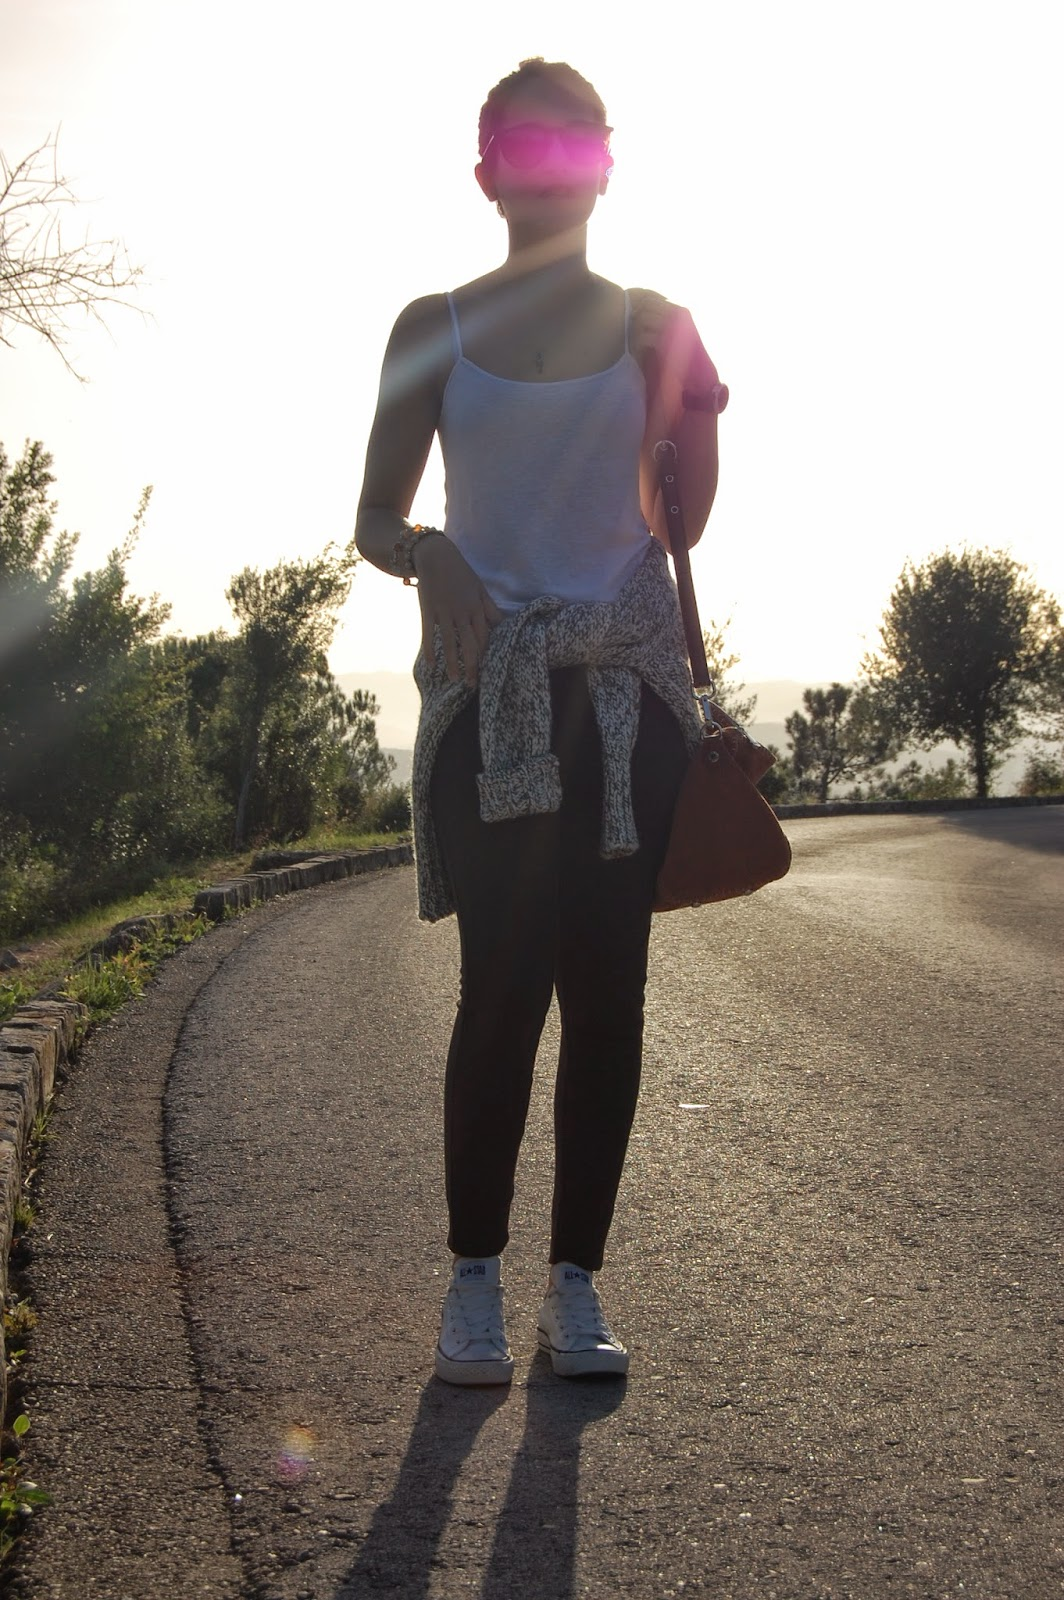 zara, bimba&lola, raybaleggins zara, bolso bimba&lola, gafas de sol rayban, jersey de zara, zapatos converse